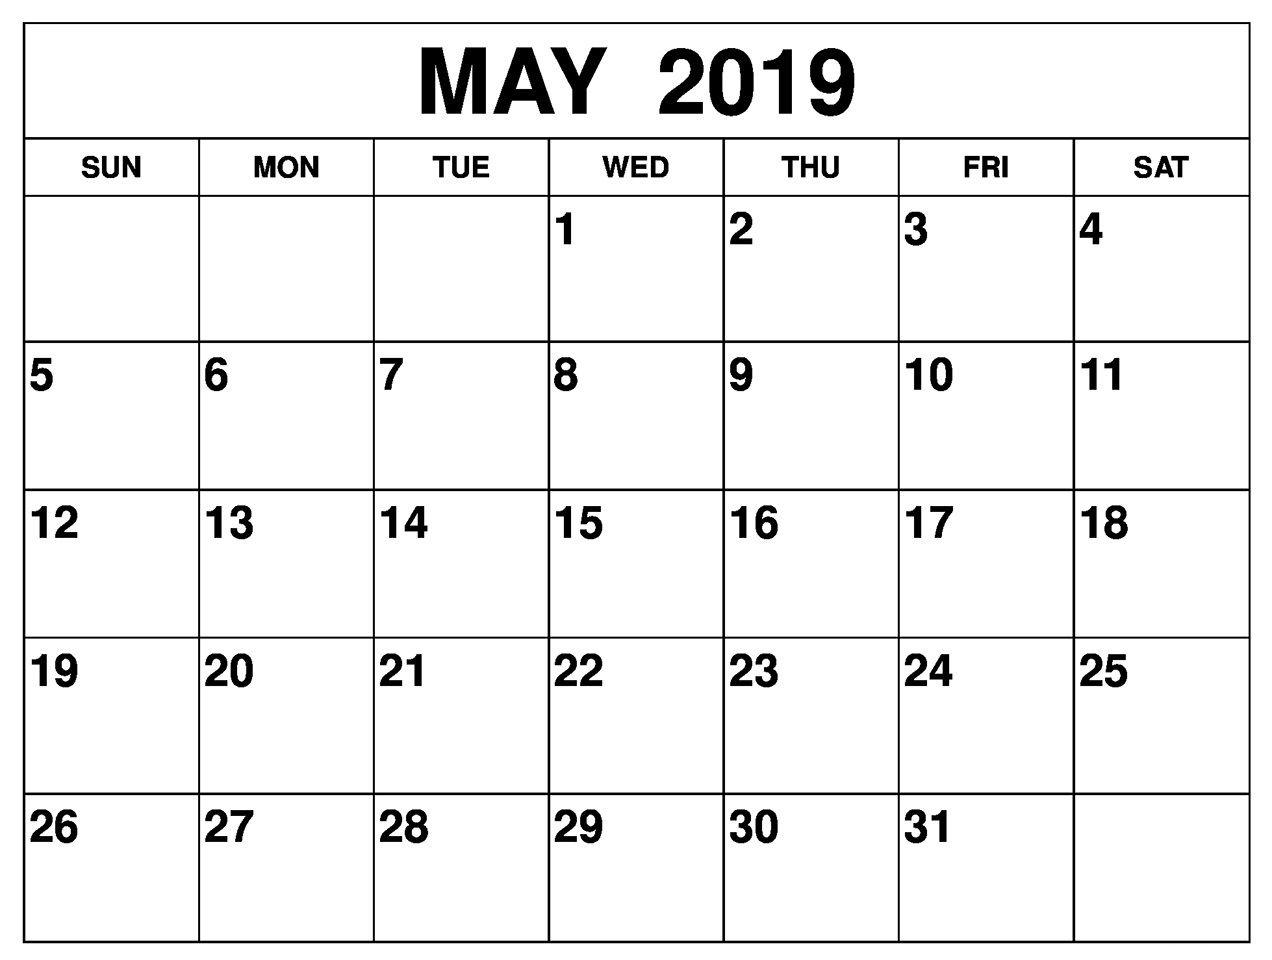 Free Printable May 2019 Calendar Editable | Blank May 2019 Calendar pertaining to Free Fillable Blank Calendar Templates